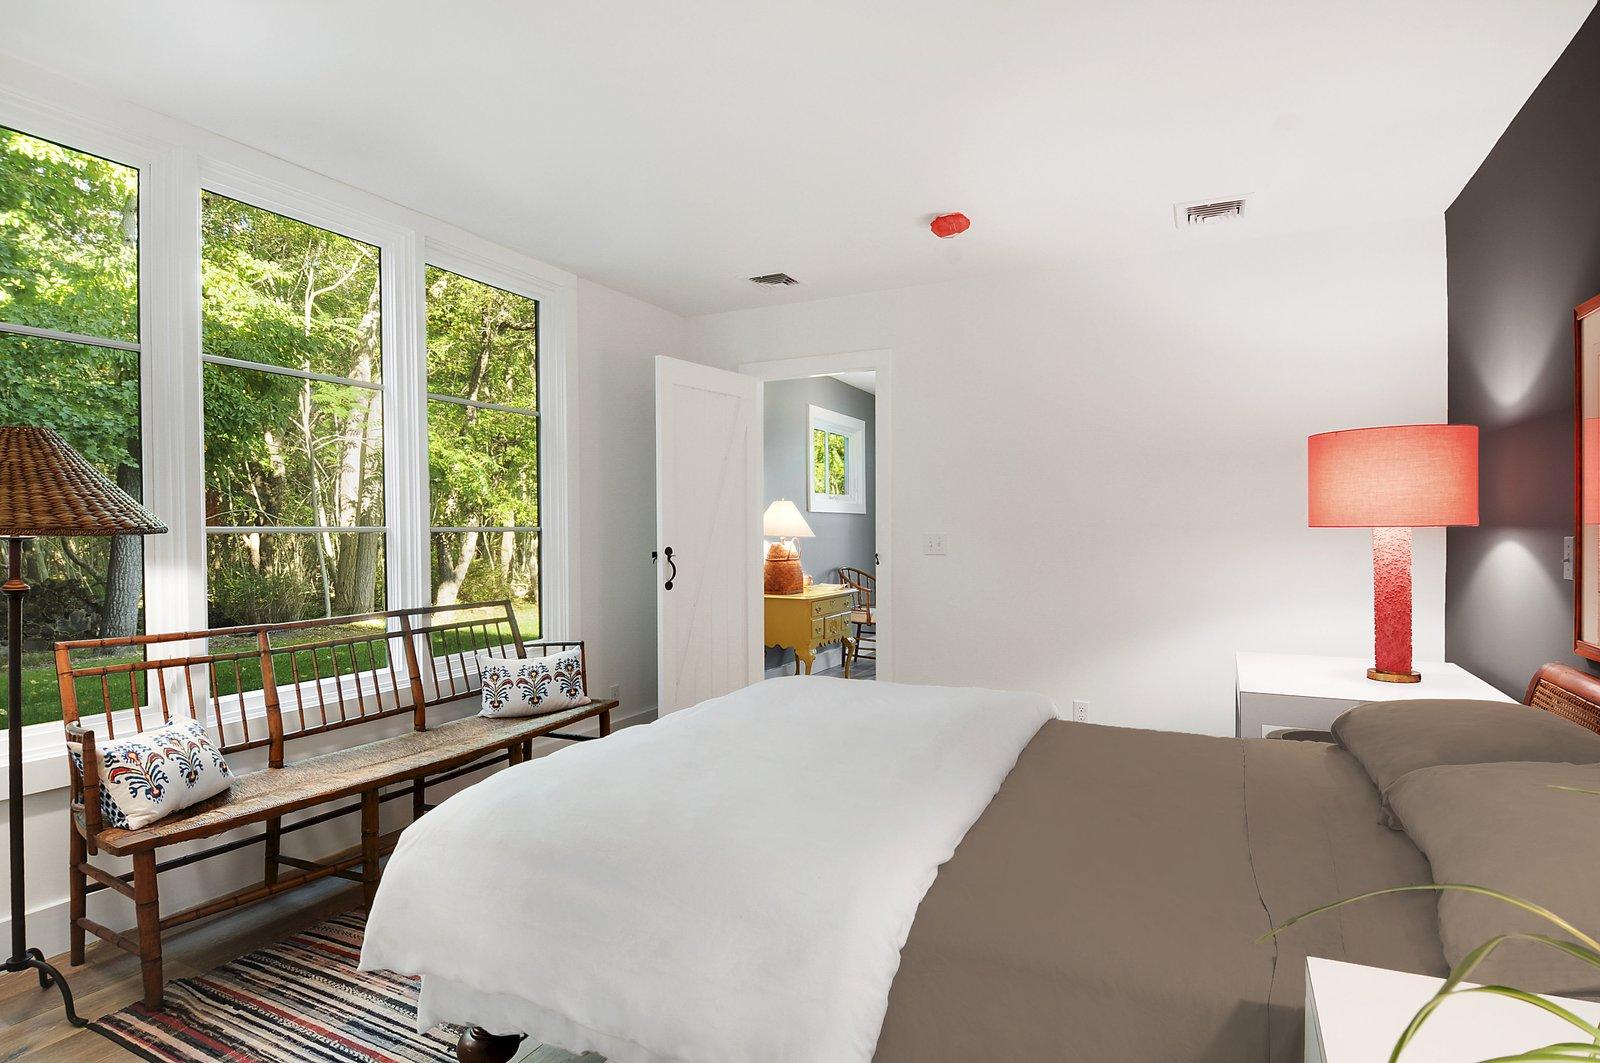 Bedroom, Bed, Night Stands, Chair, Bench, Lamps, Ceiling Lighting, Recessed Lighting, Light Hardwood Floor, and Rug Floor  North Haven Compound